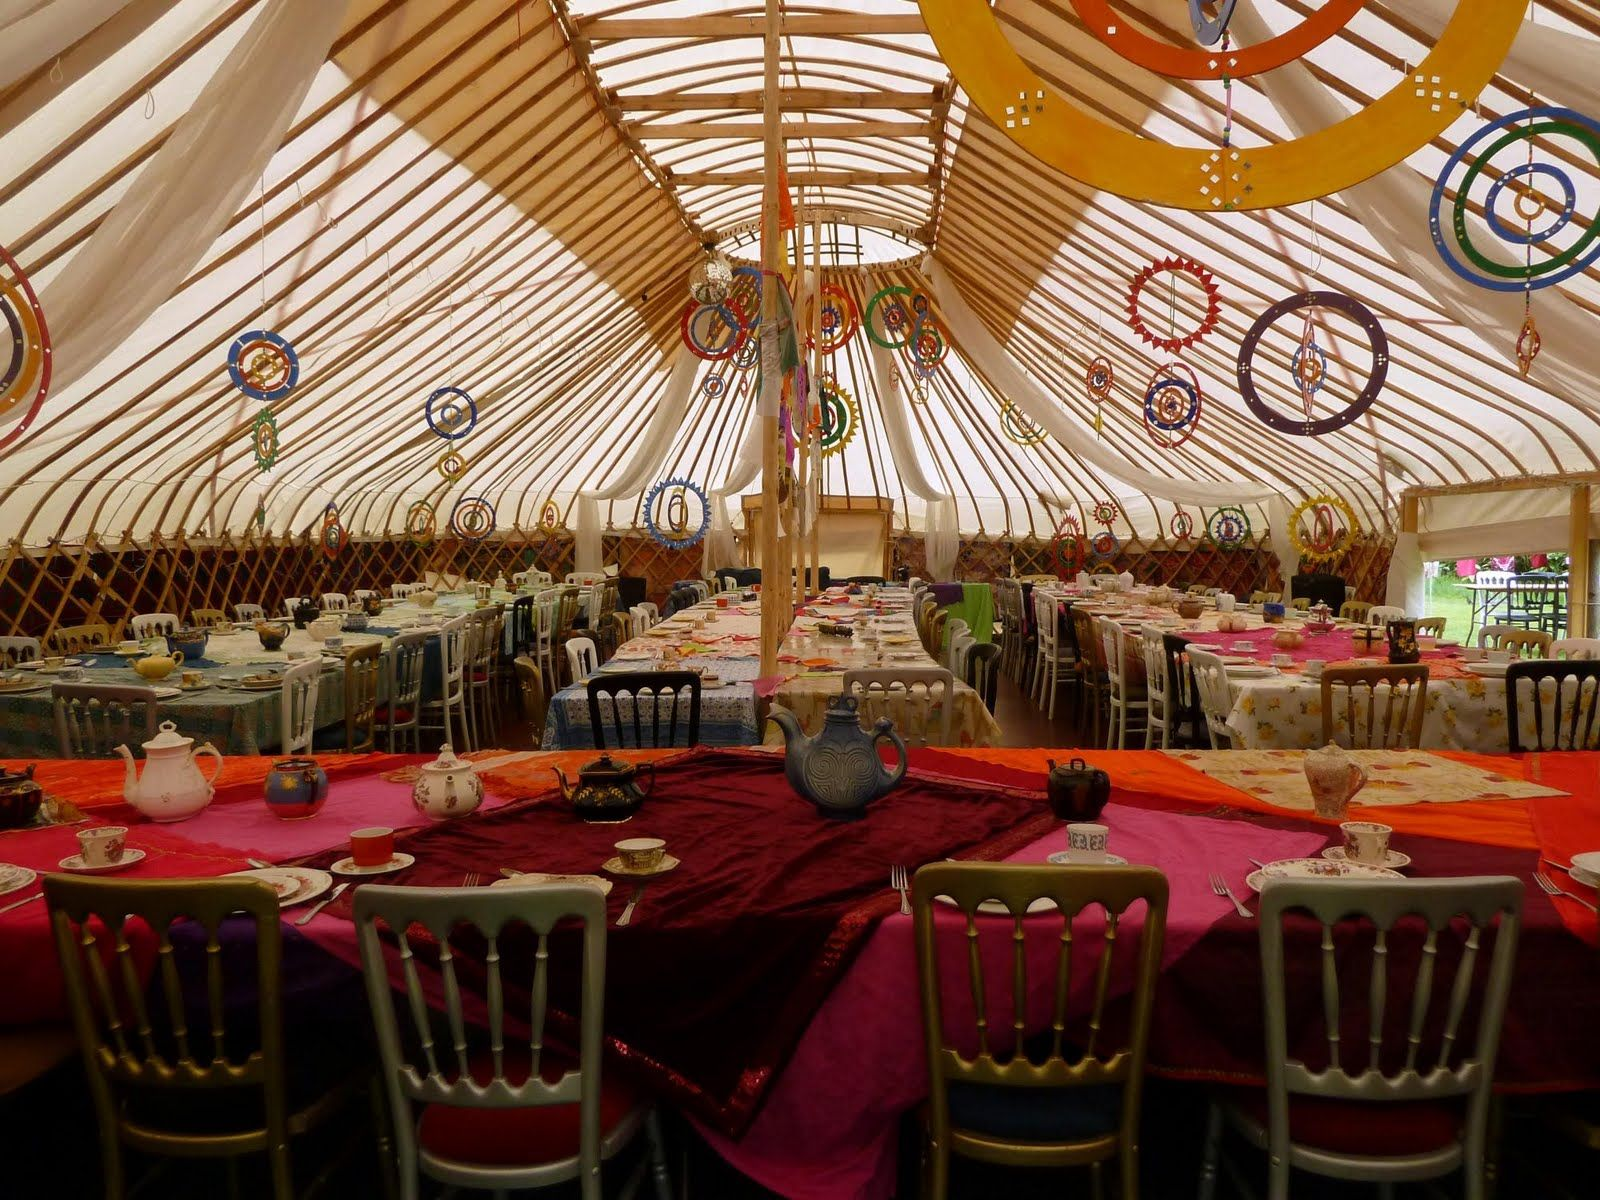 Red Kite Yurts Yurt Wedding On The West Coast Of Scotland Yurts